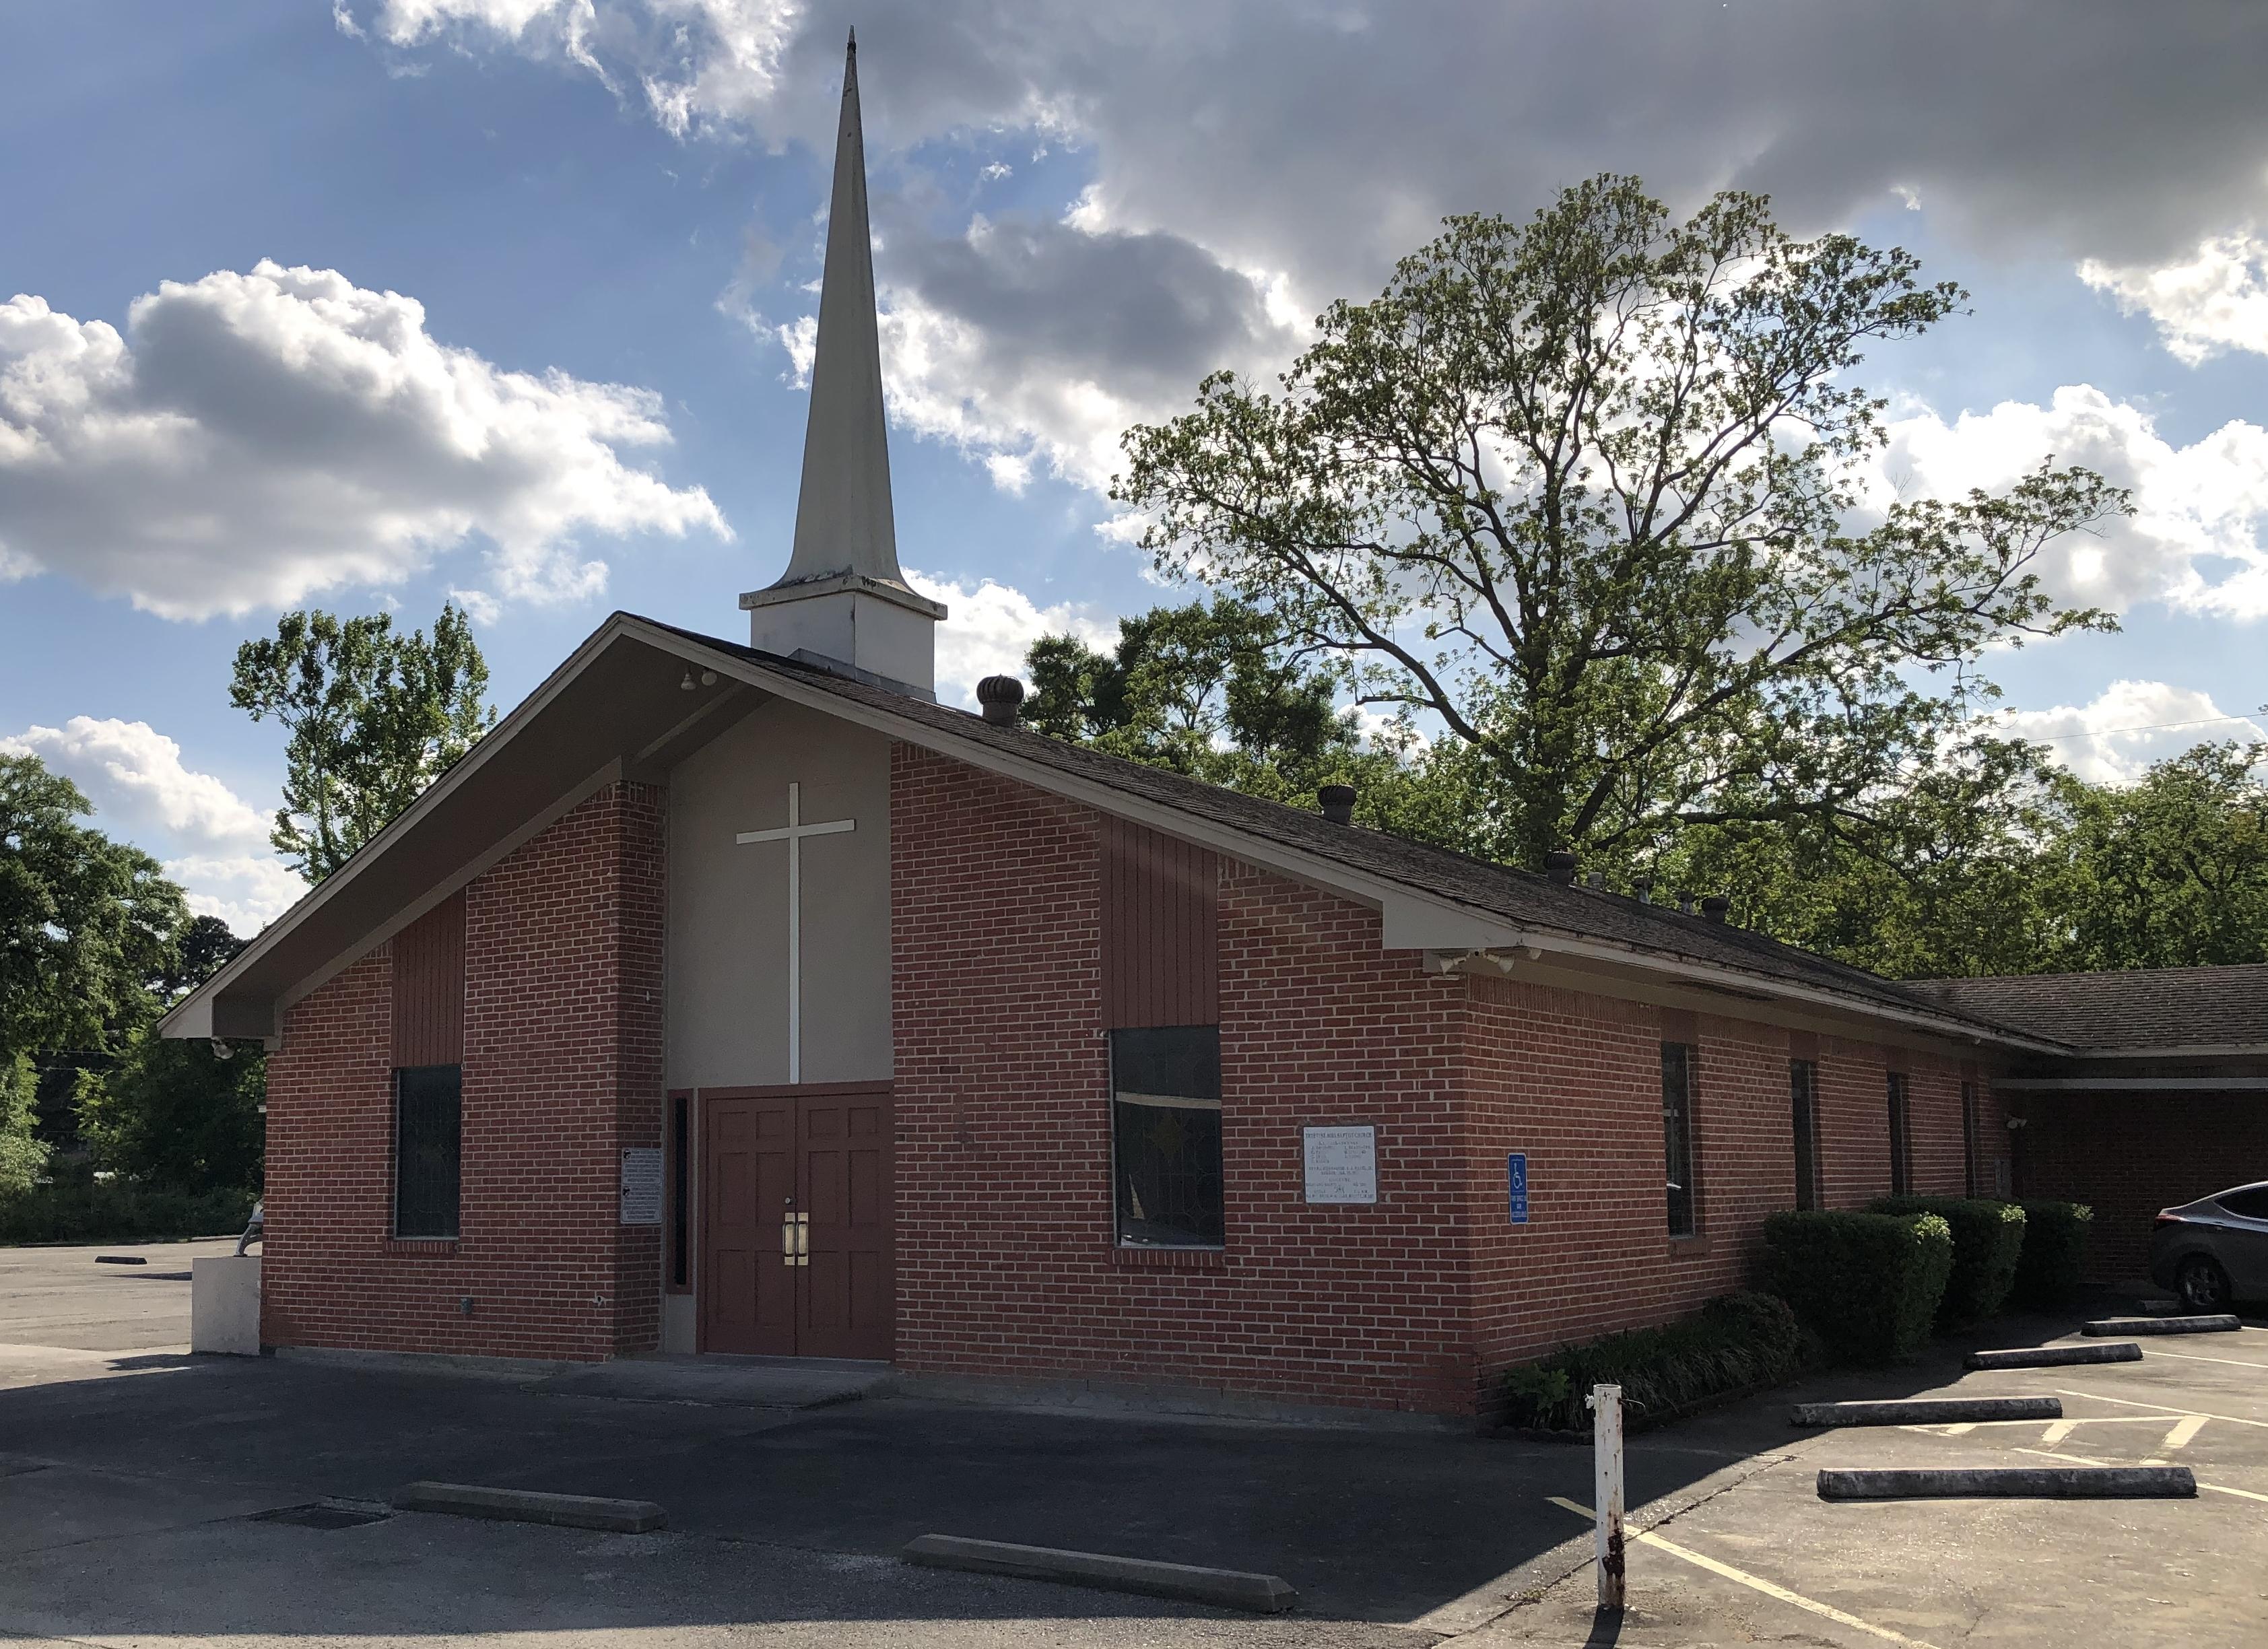 Truevine Missionary Baptist Church